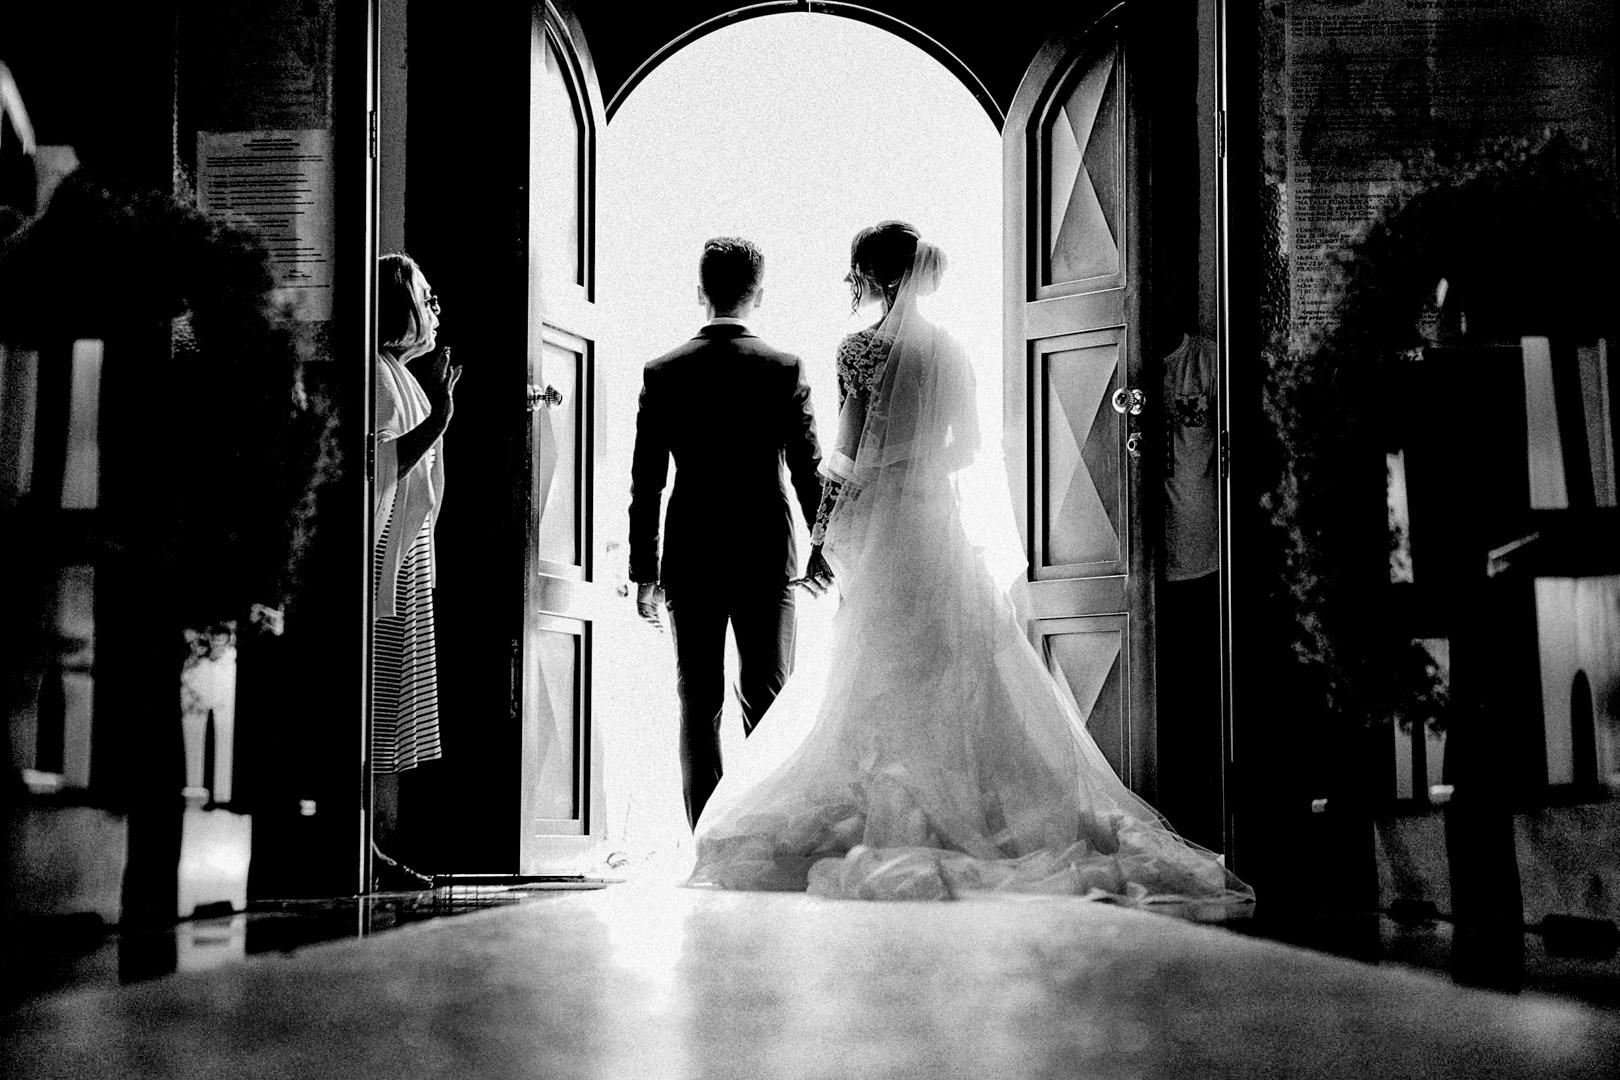 18 gianni-lepore-uscita-chiesa-sposi